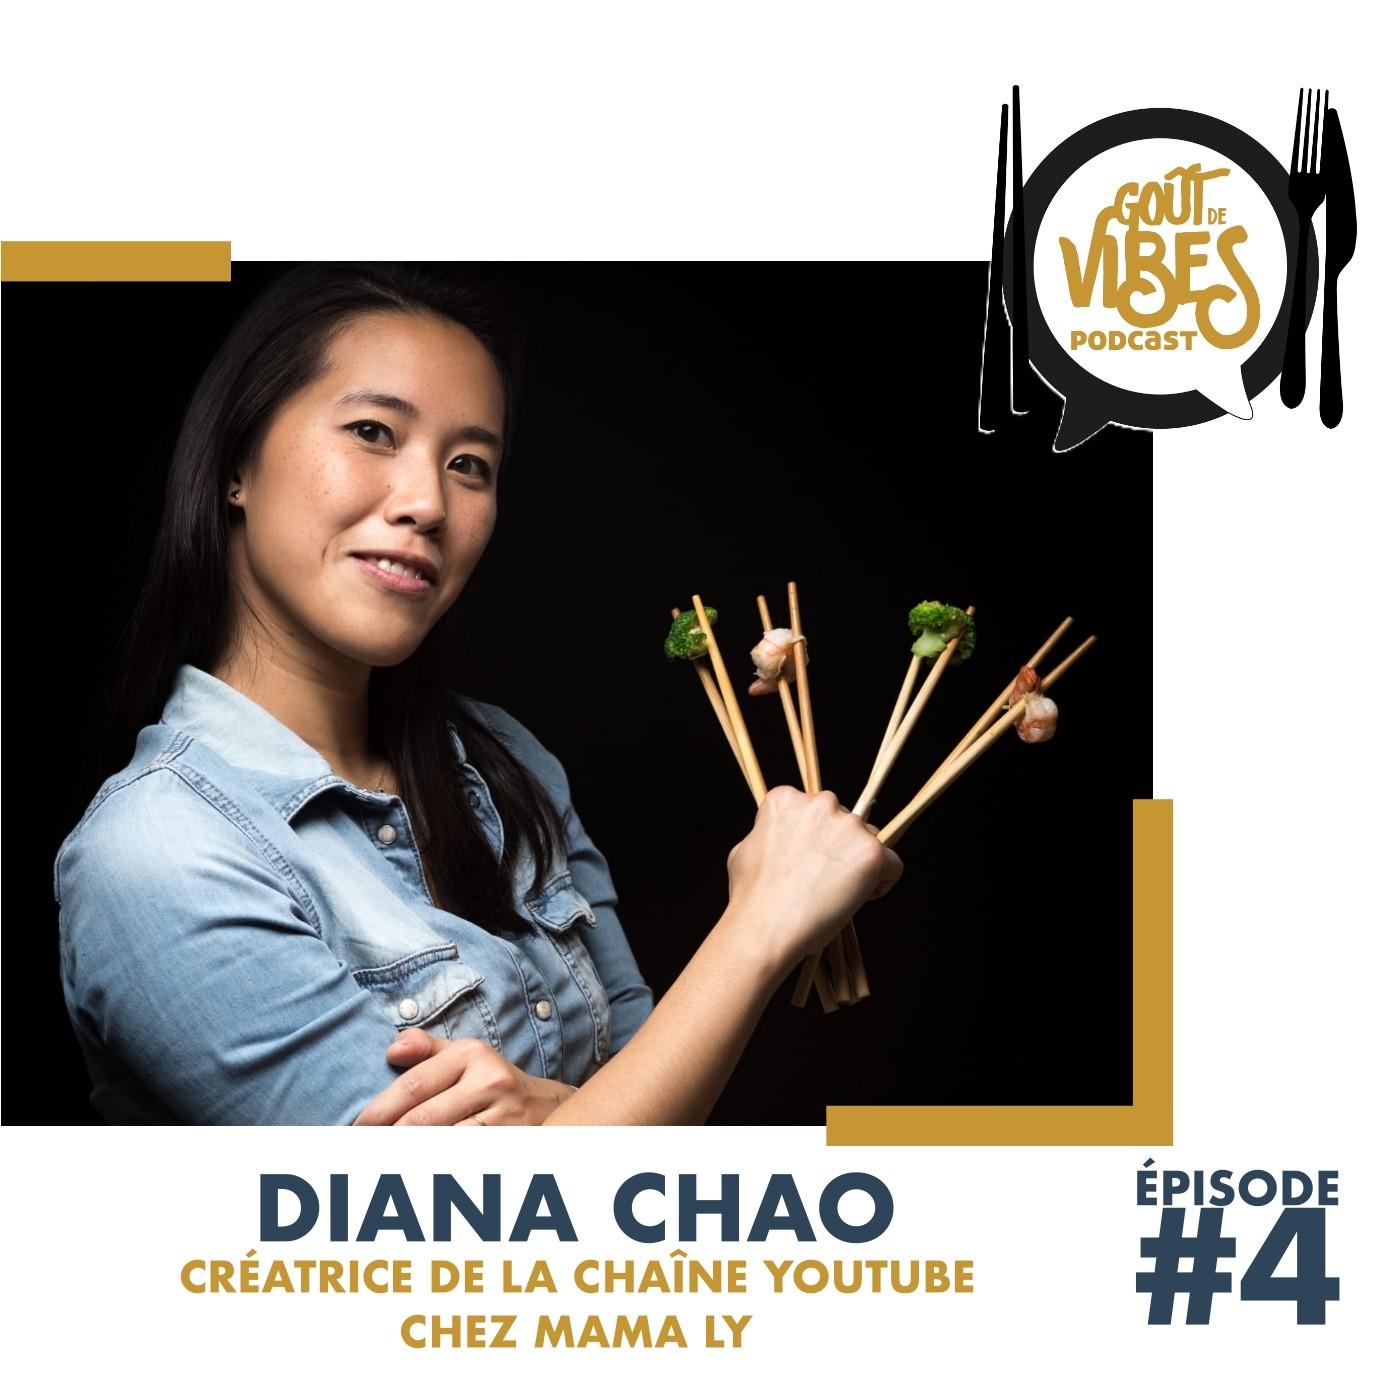 (#4) Diana Chao, créatrice de la chaîne Youtube Chez Mama Ly